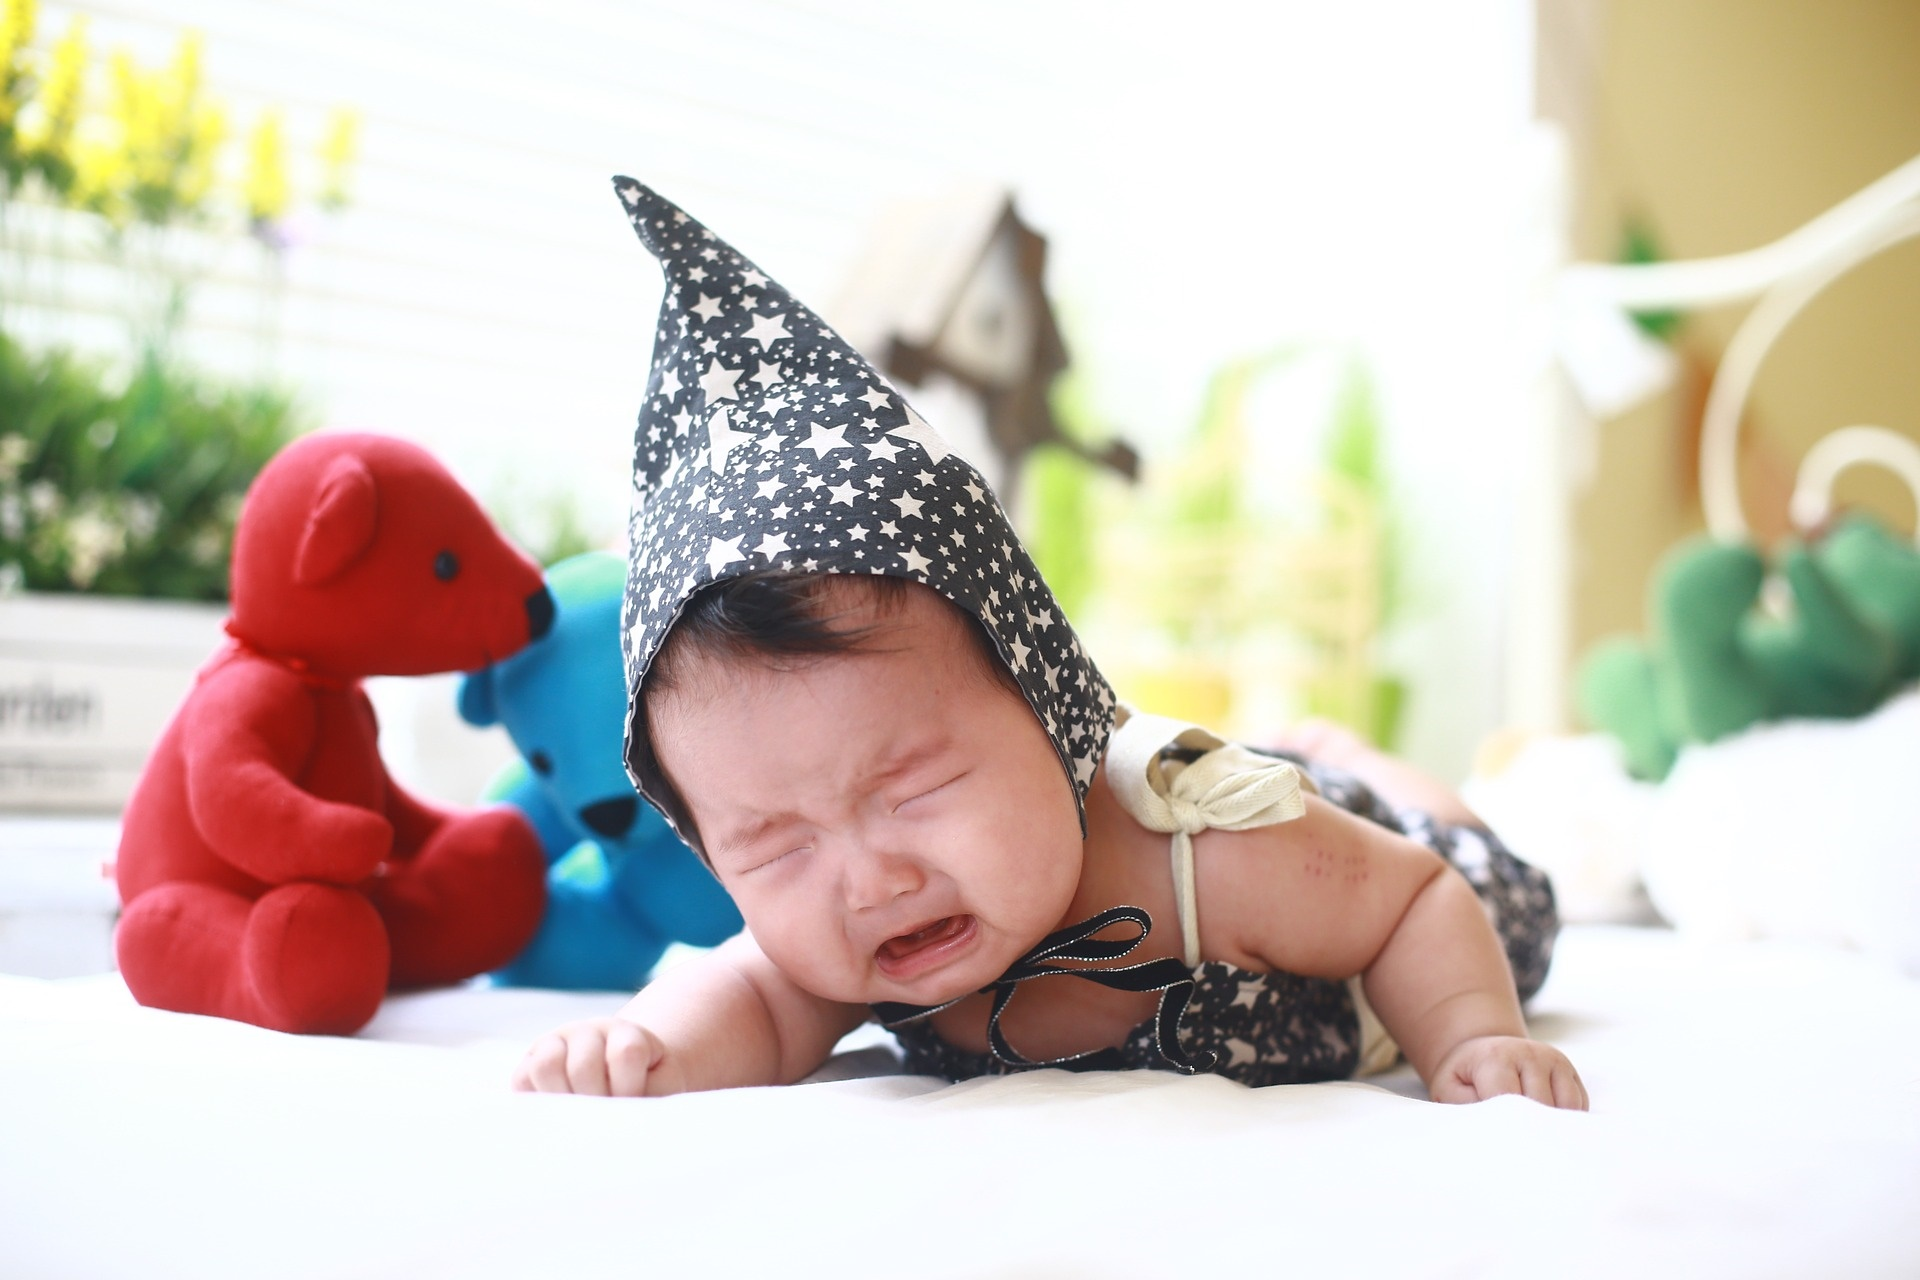 Mal di pancia nei bambini: rimedi naturali ed efficaci